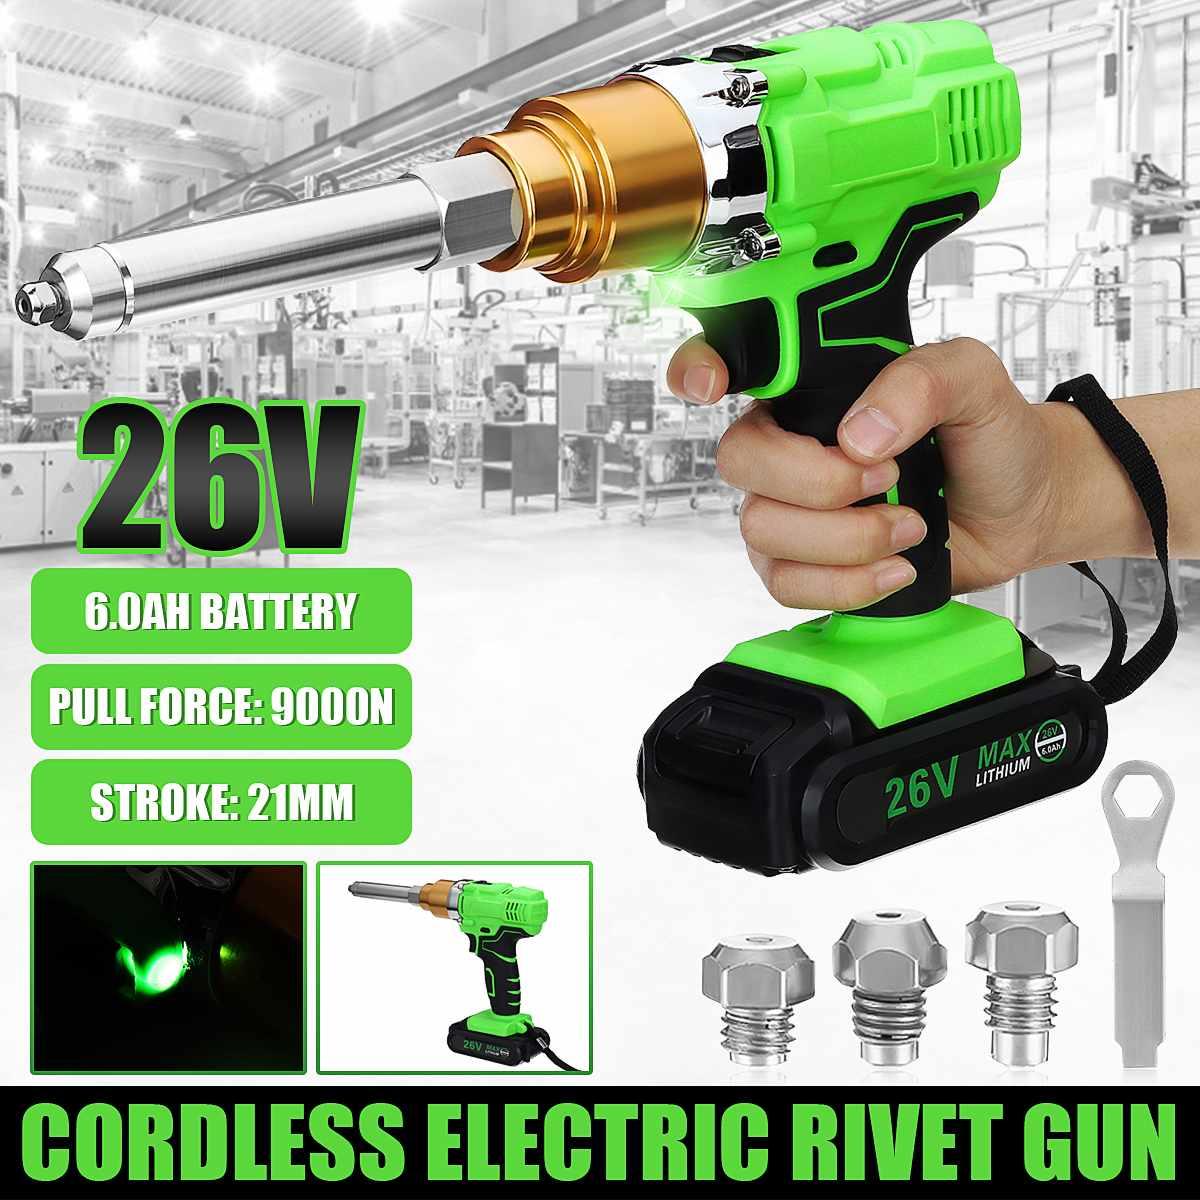 26V اللاسلكي الكهربائية برشام بندقية 2.1 مللي متر المحمولة الكهربائية أعمى المبرشم مفك Rvet الجوز مع LED ضوء بطارية قابلة للشحن